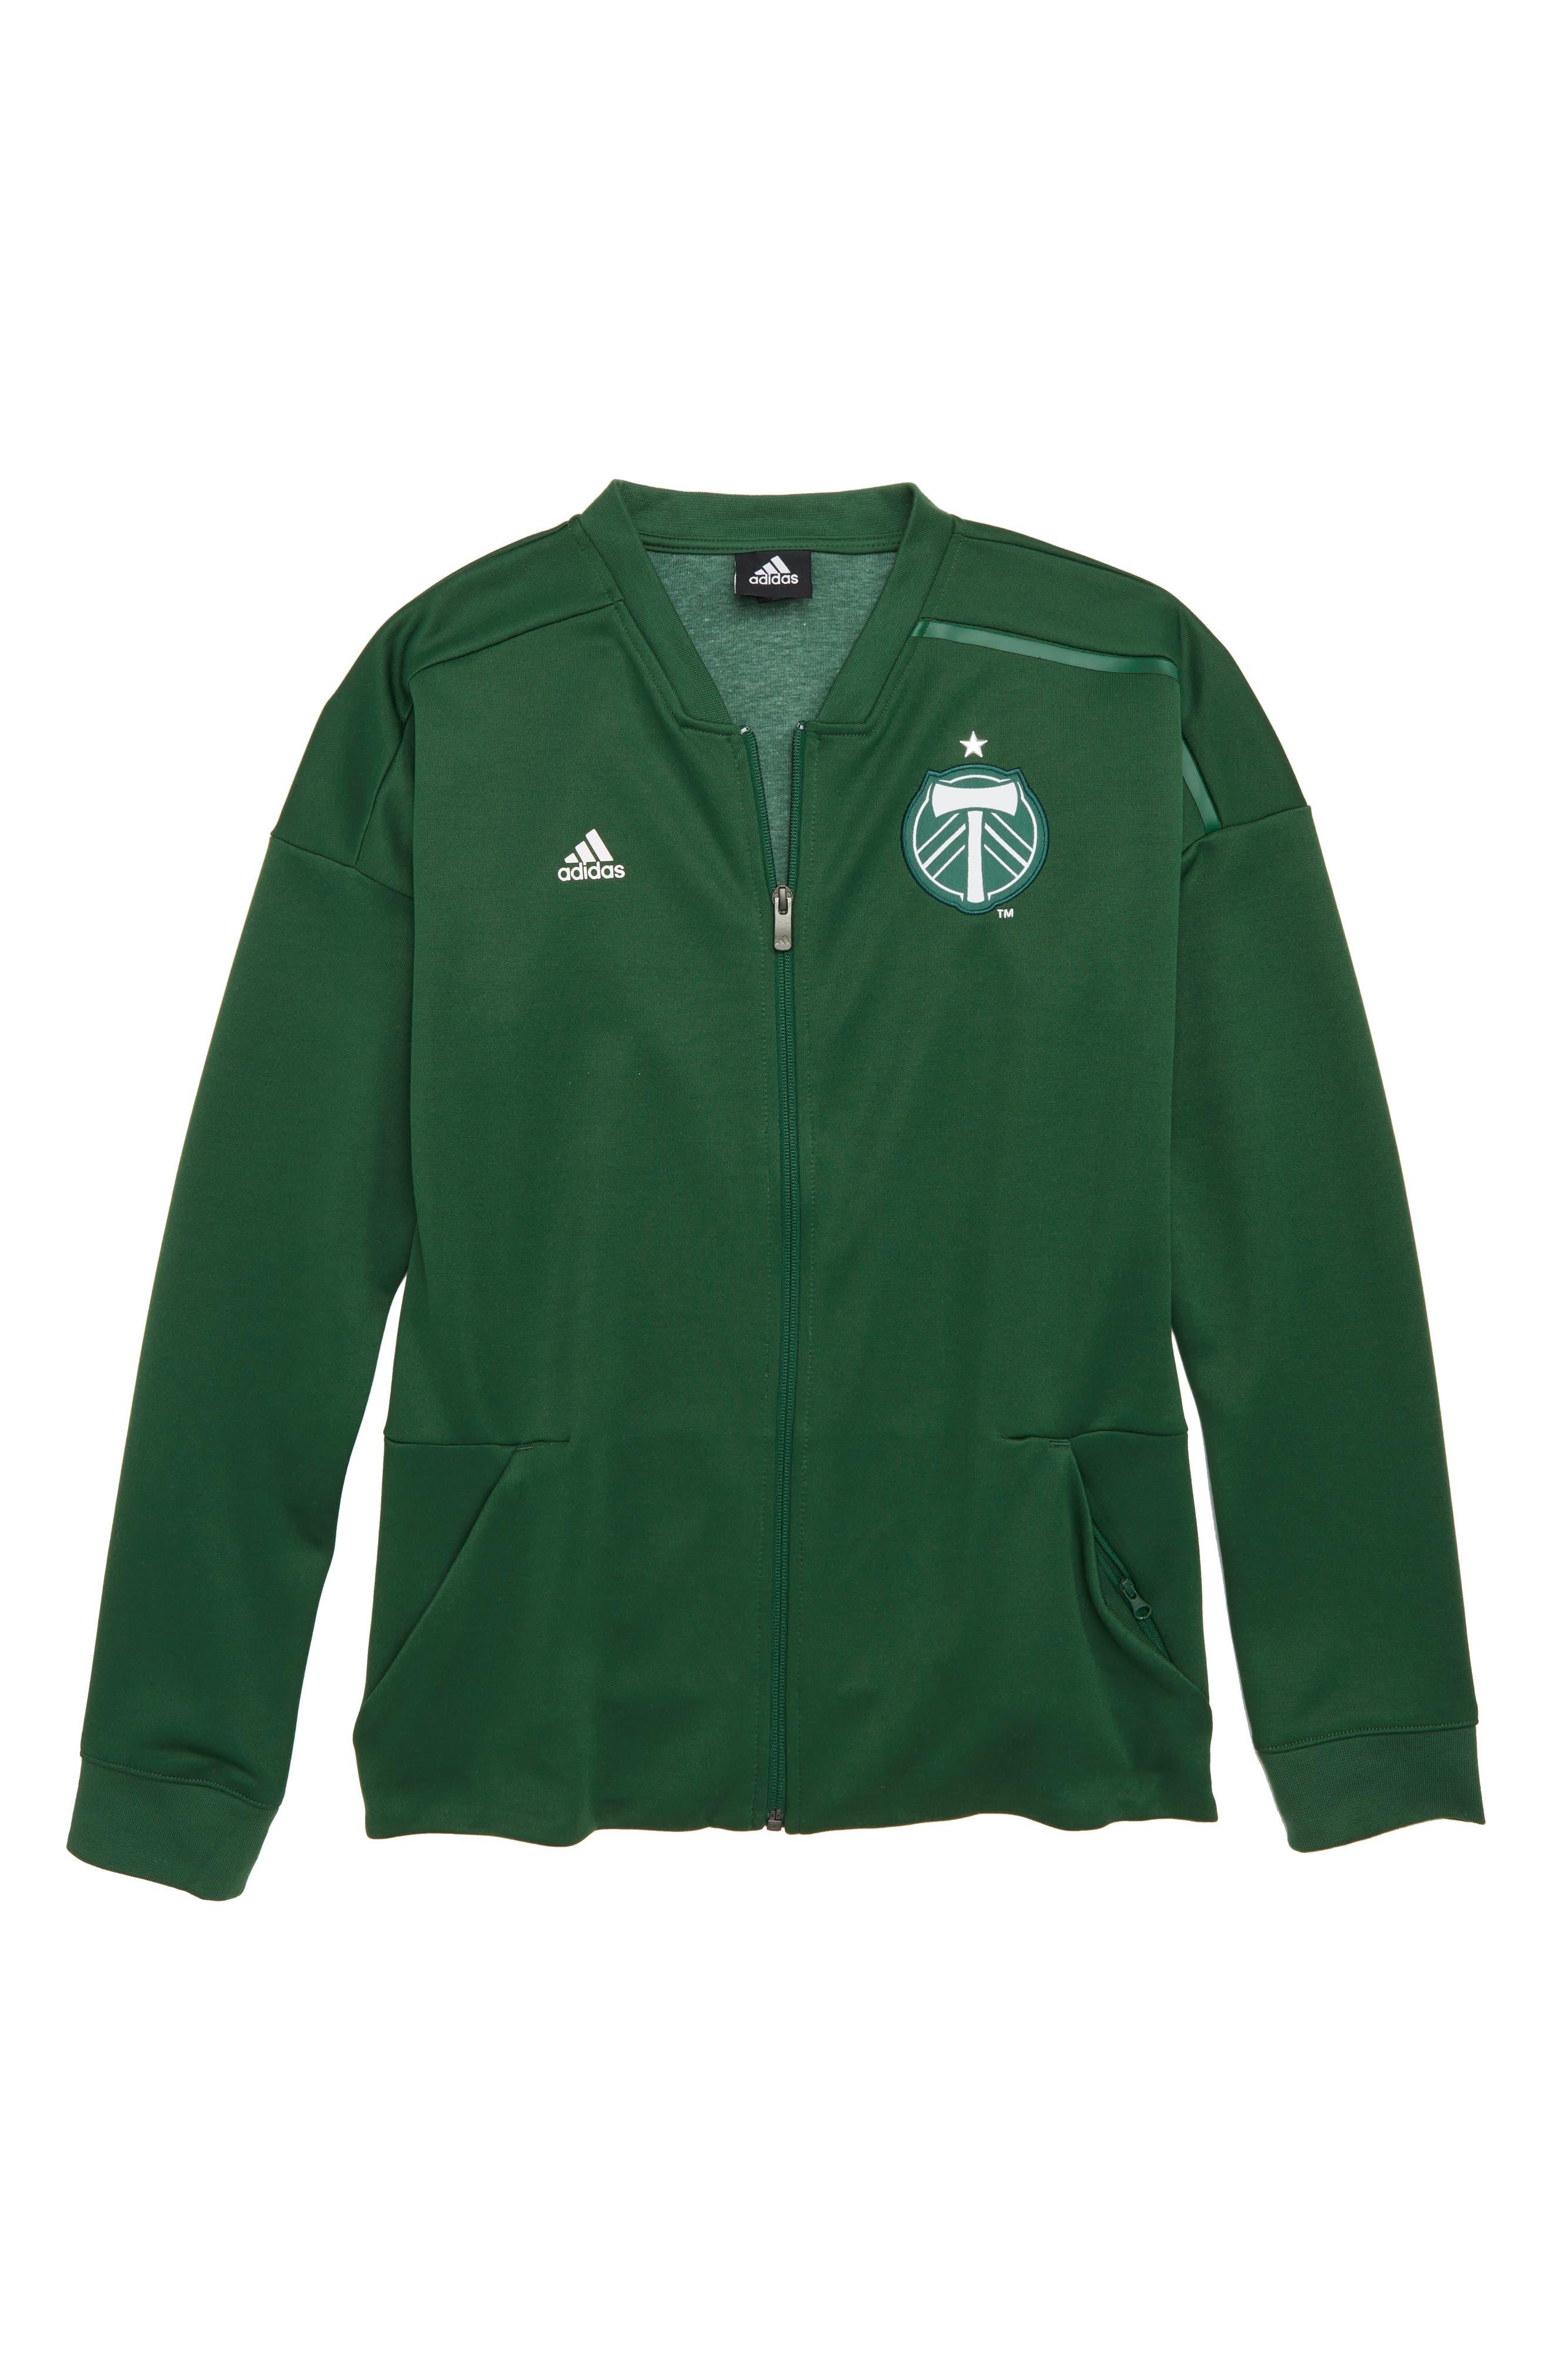 MLS Portland Timbers Anthem Full Zip Jacket,                             Main thumbnail 1, color,                             300